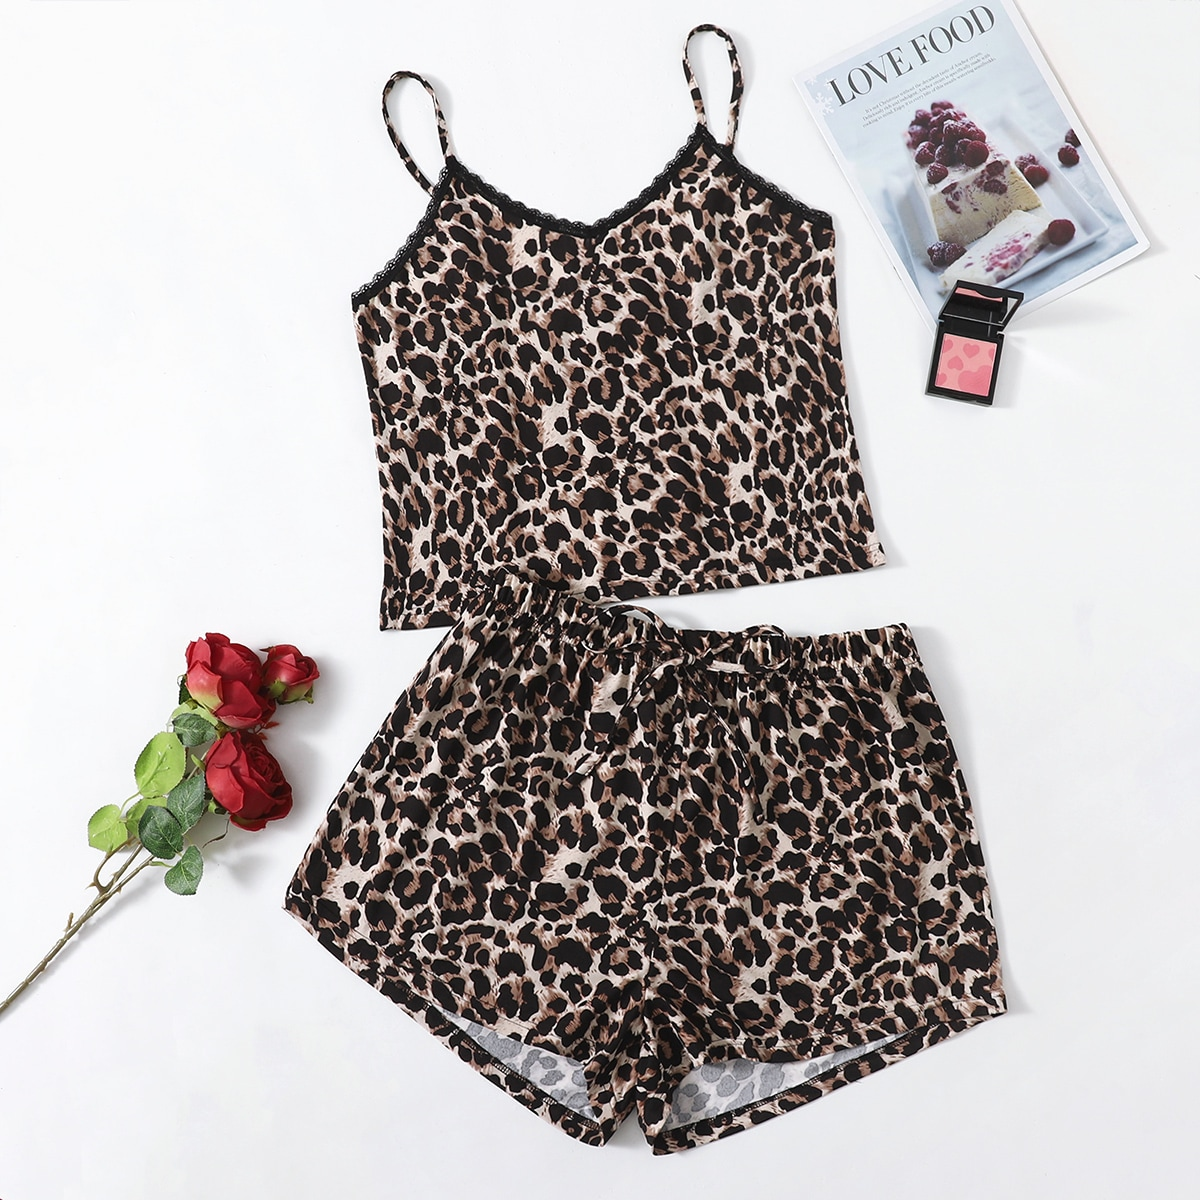 Plus Leopard Print Lace Trim Cami PJ Set, SHEIN  - buy with discount